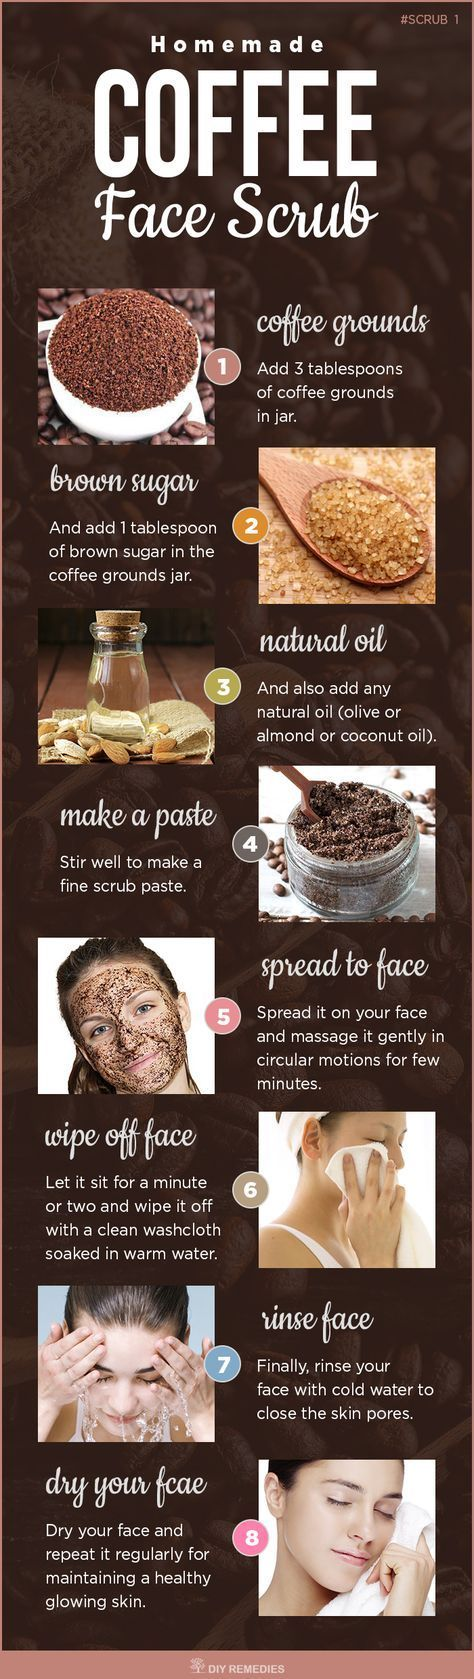 Homemade Natural Face Coffee Scrub Perawatan kulit alami